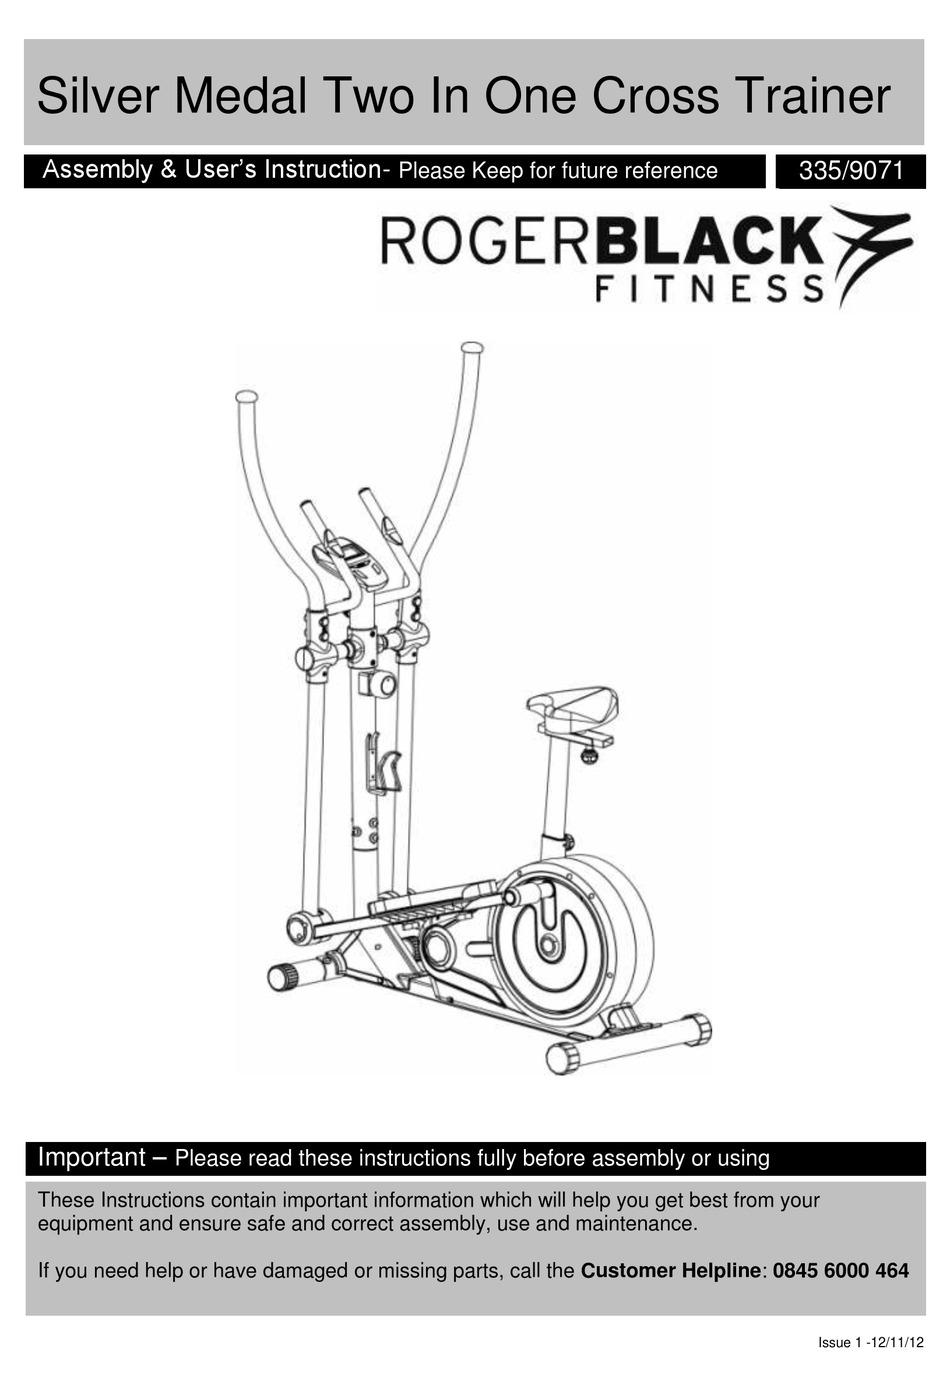 Roger Black Gold Exercise Bike Instruction Manual